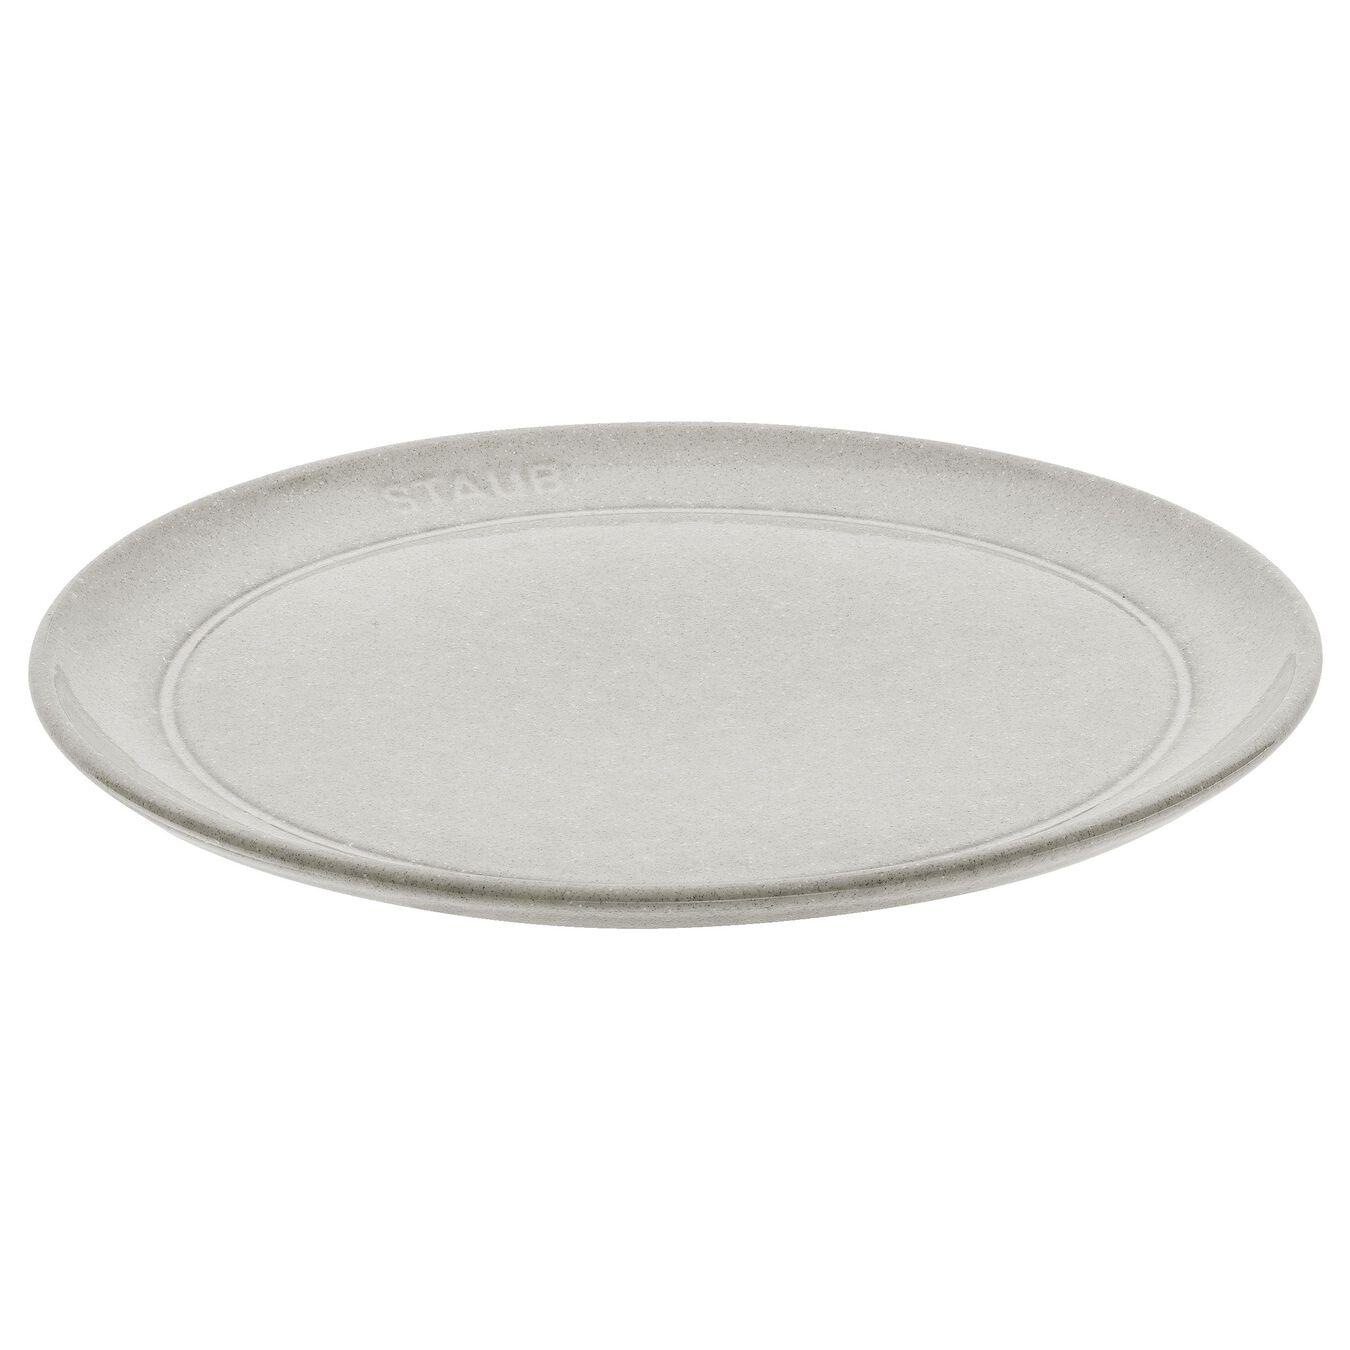 20 cm round Plate flat, white truffle,,large 1